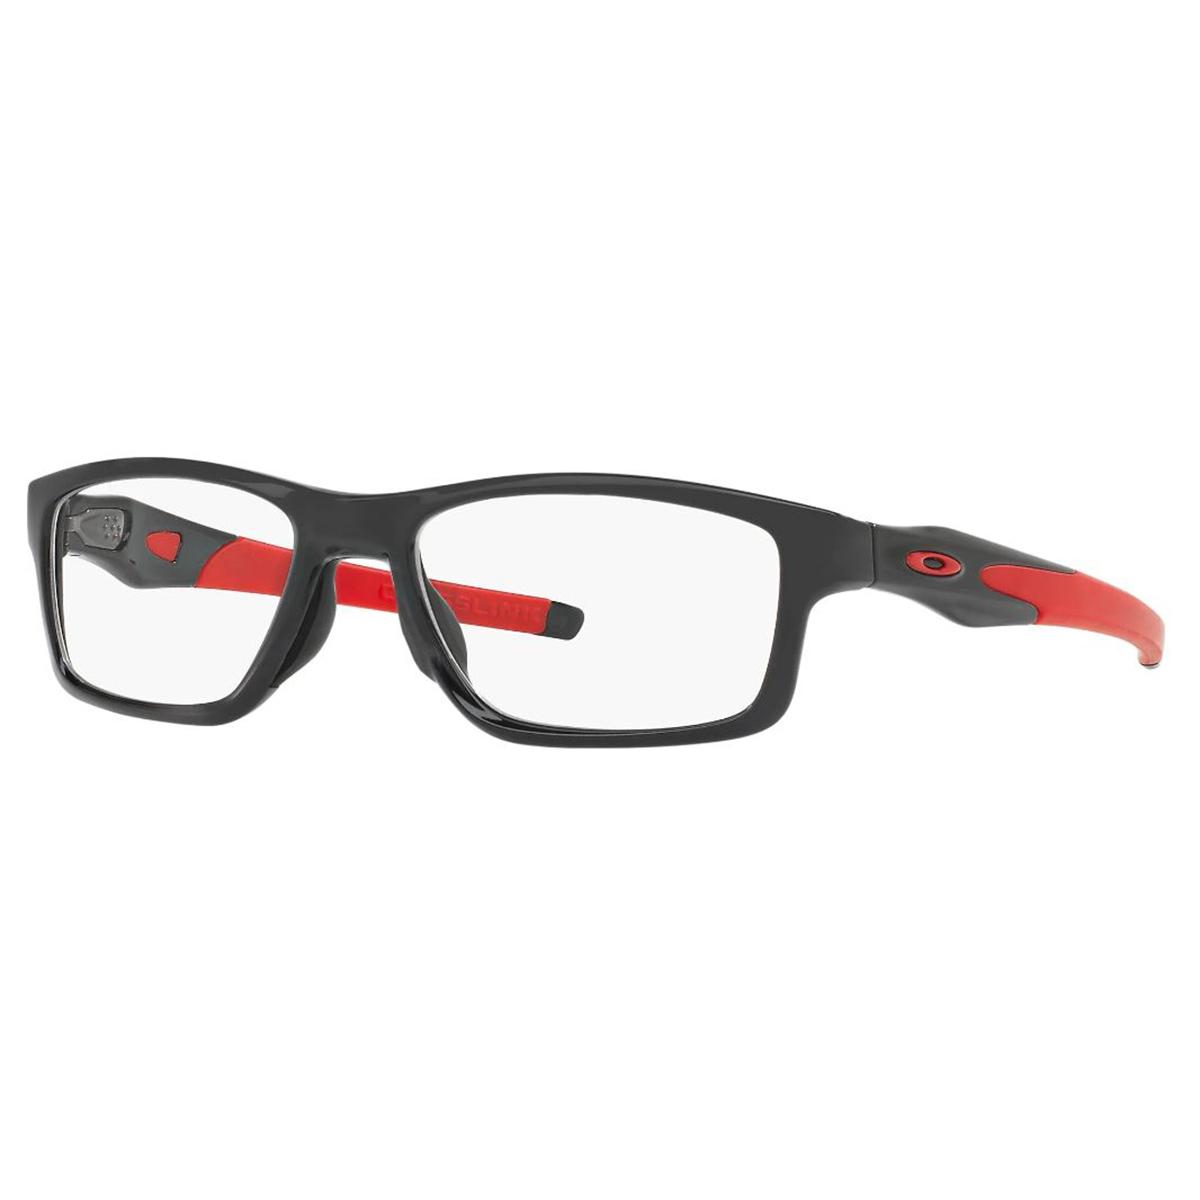 Óculos Oakley Crosslink MNP OX8090 Troca Hastes Preto e Vermelho